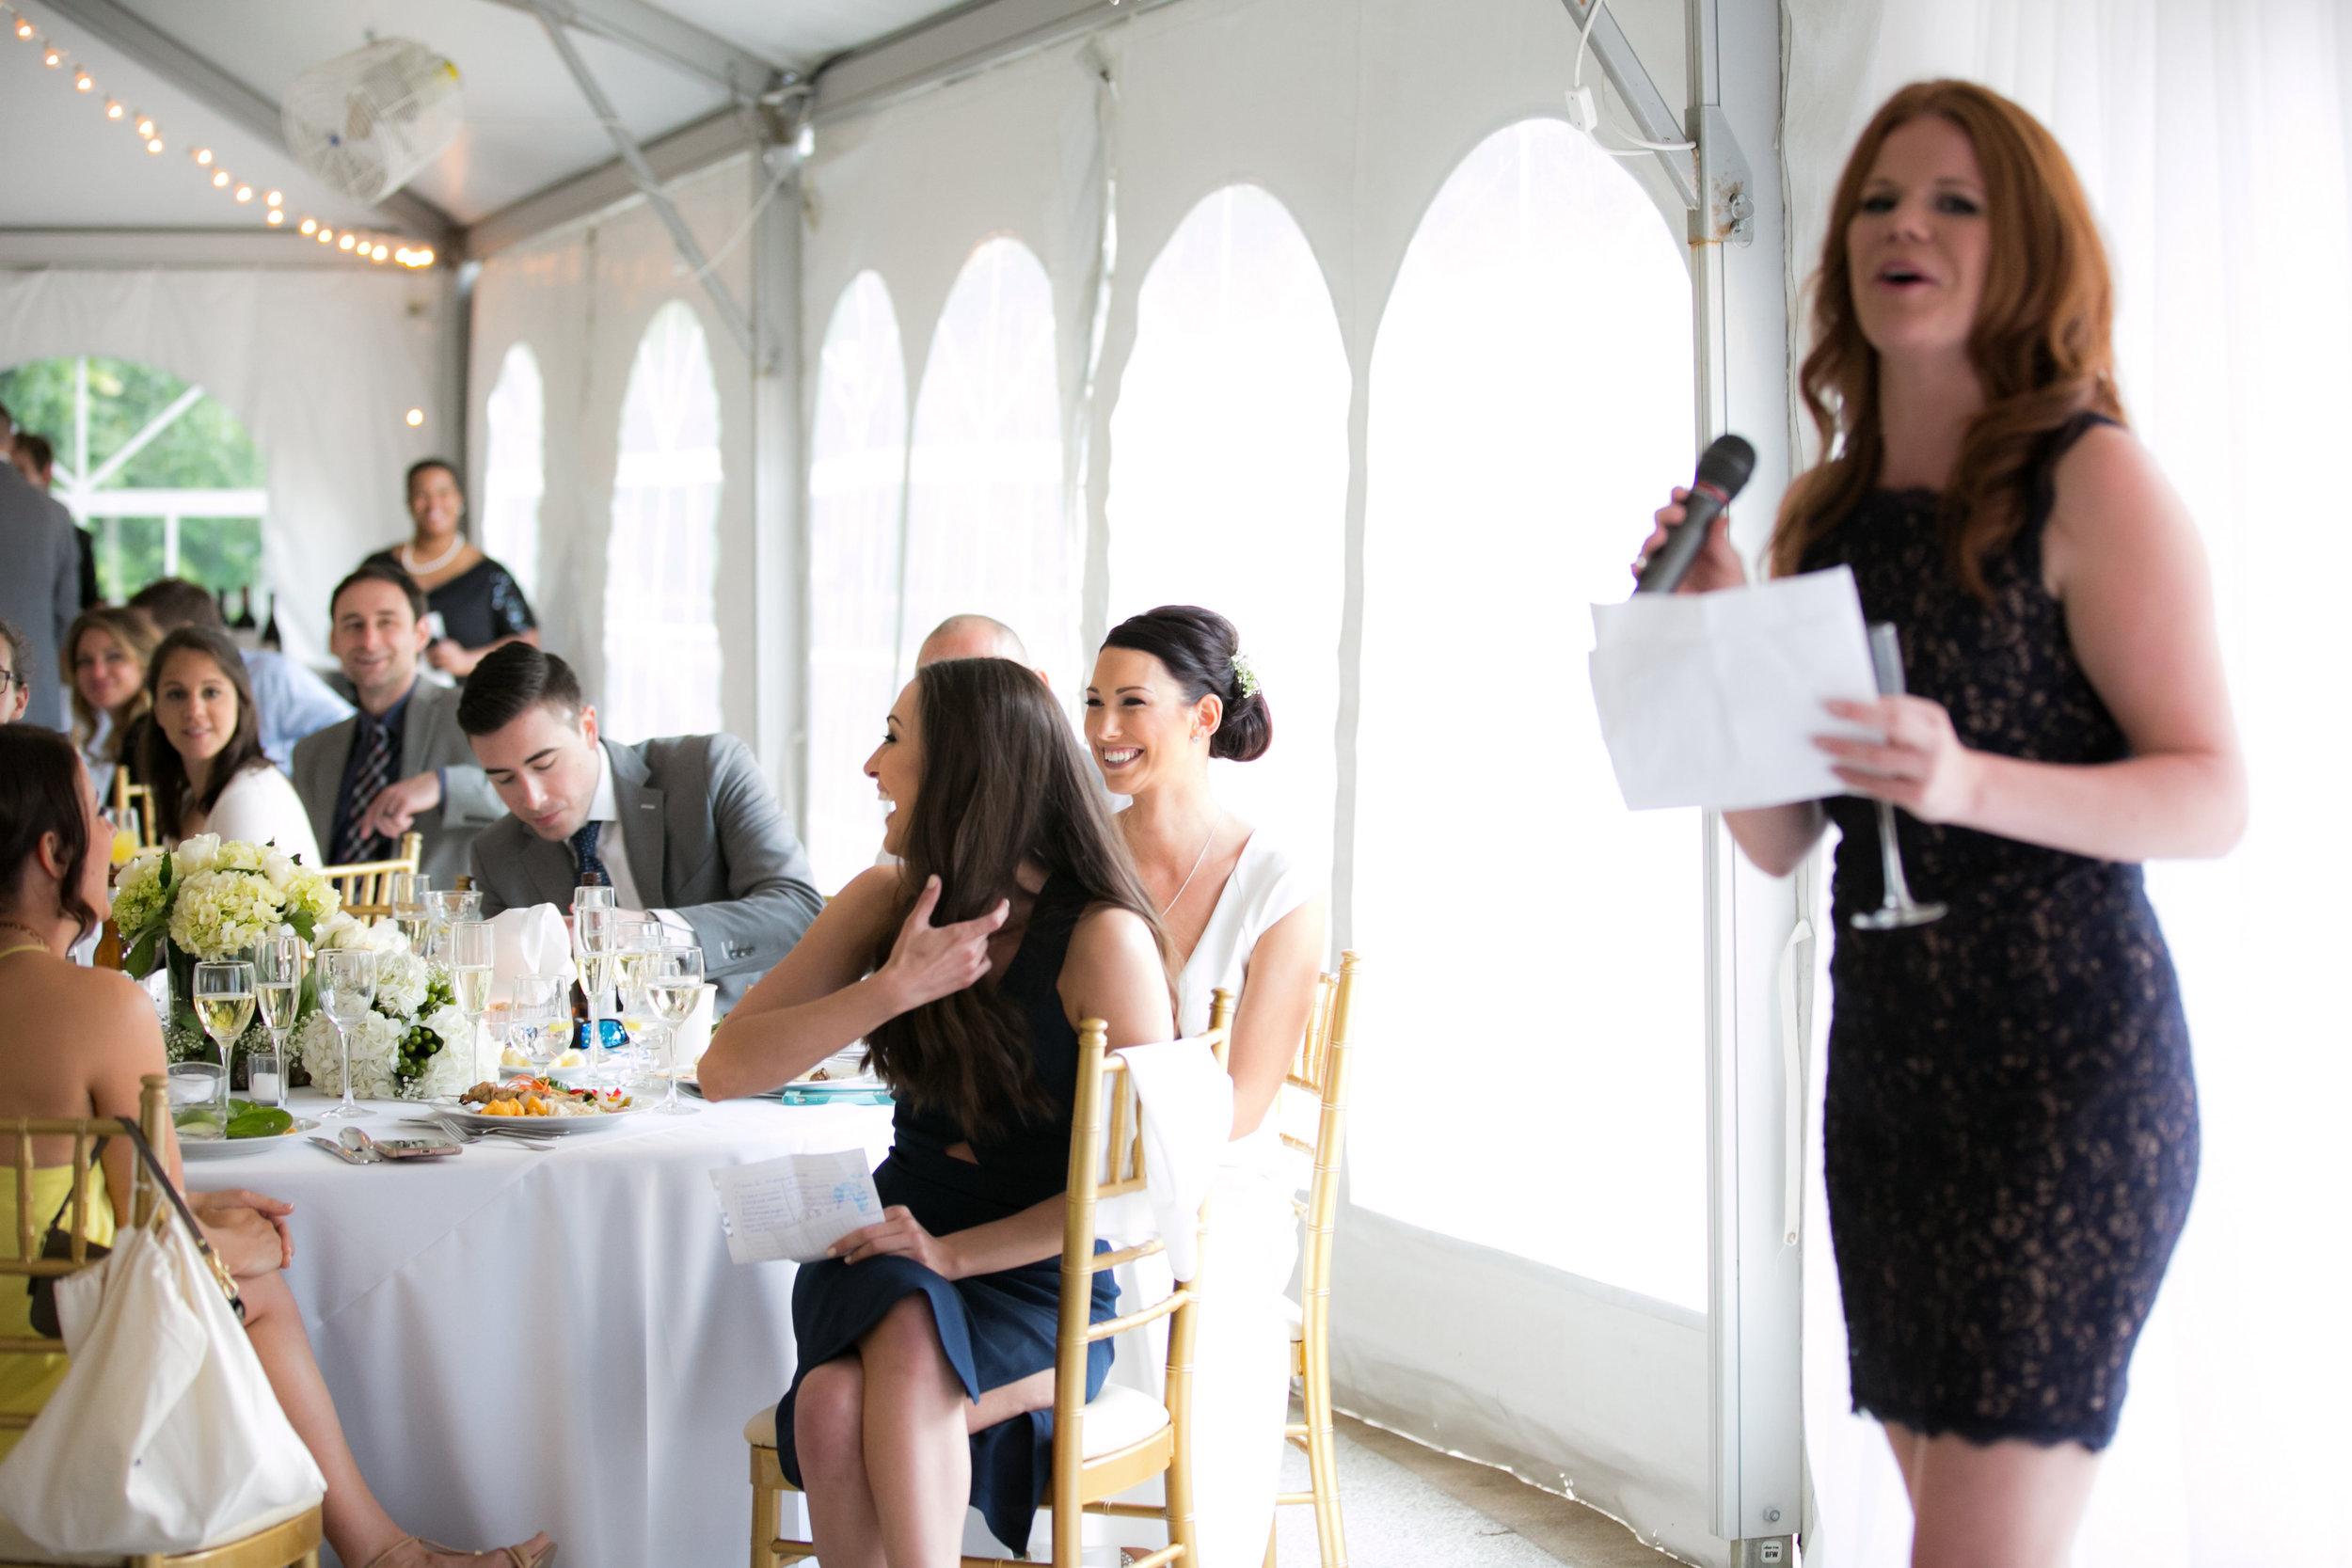 Pure elegance events Tynise Kee dc wedding planner va wedding planner rust manor house leesburg -0060.jpg